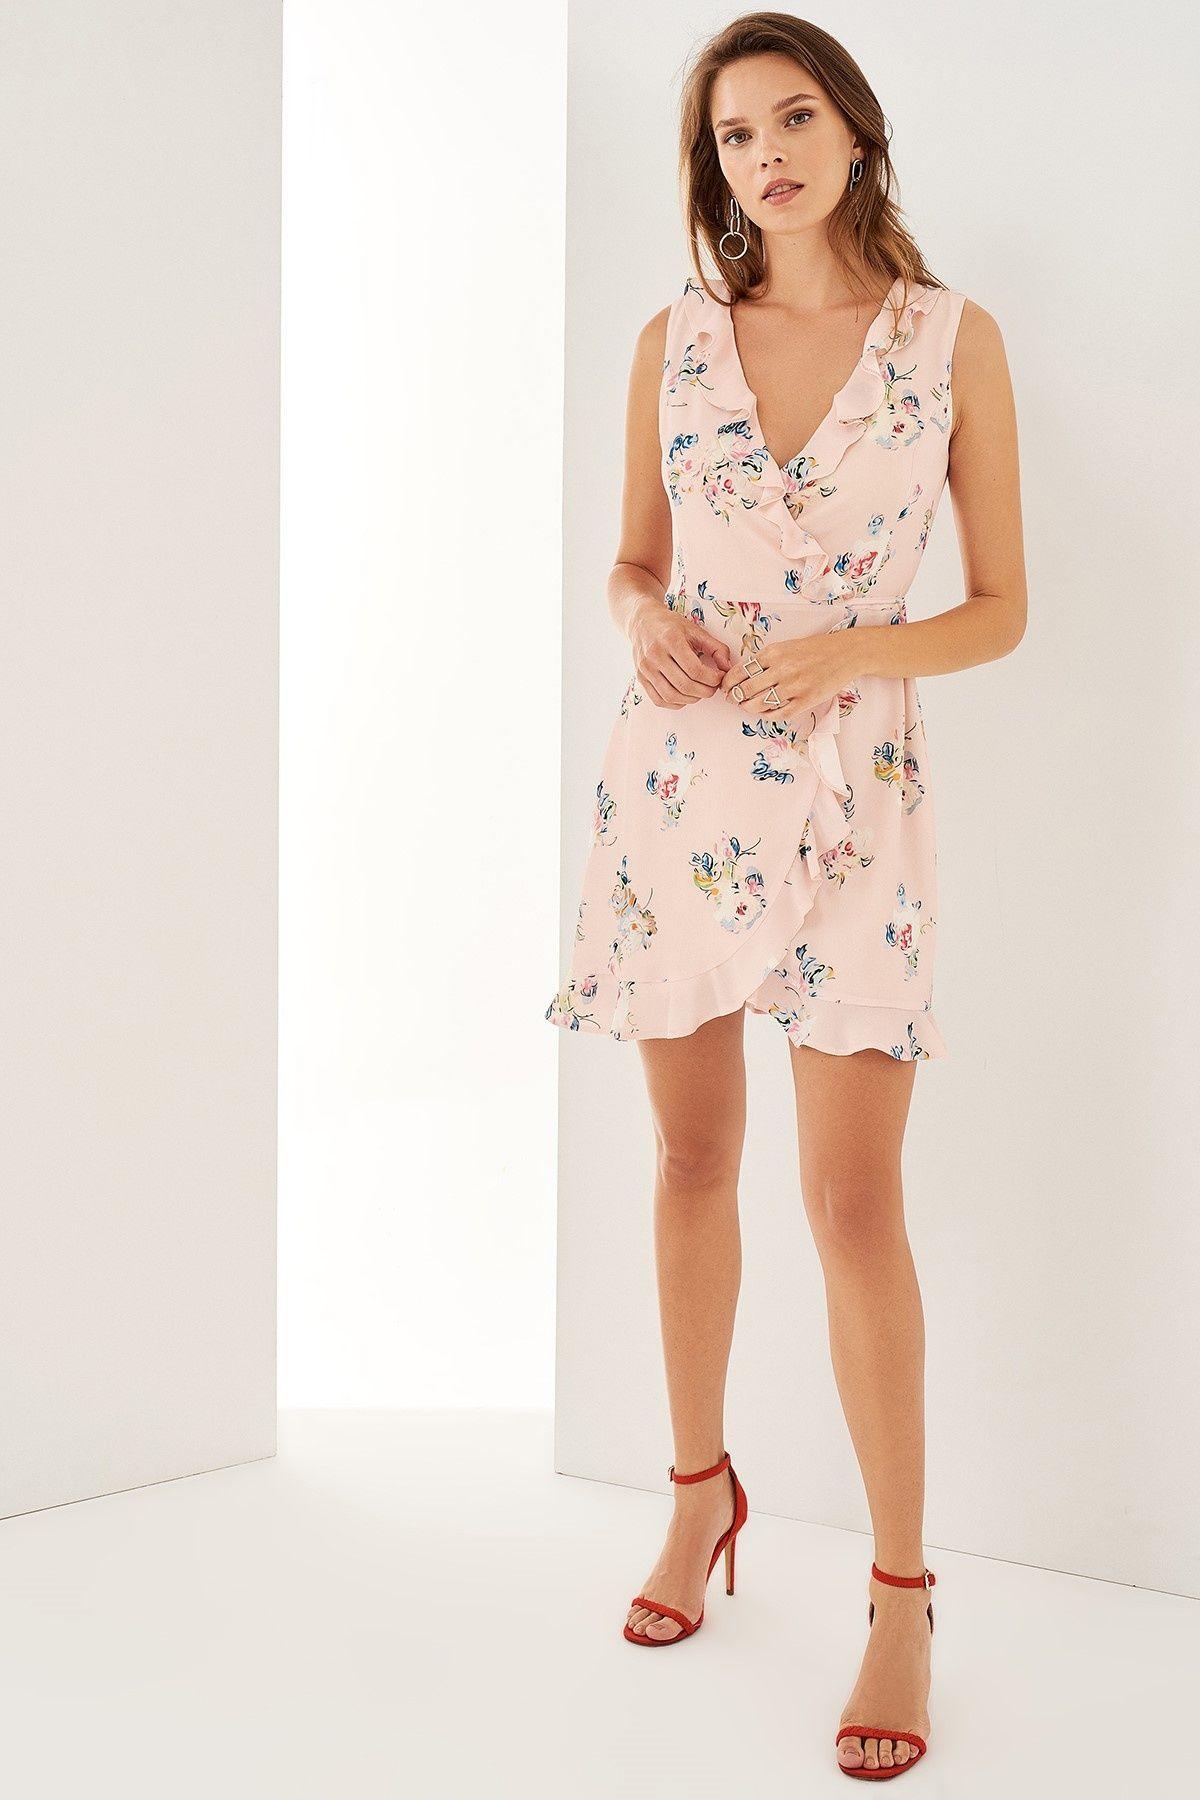 Pembe Cicek Desenli Kruvaze Elbise Trendyolmilla Trendyol Elbise Modelleri Elbise Elbiseler